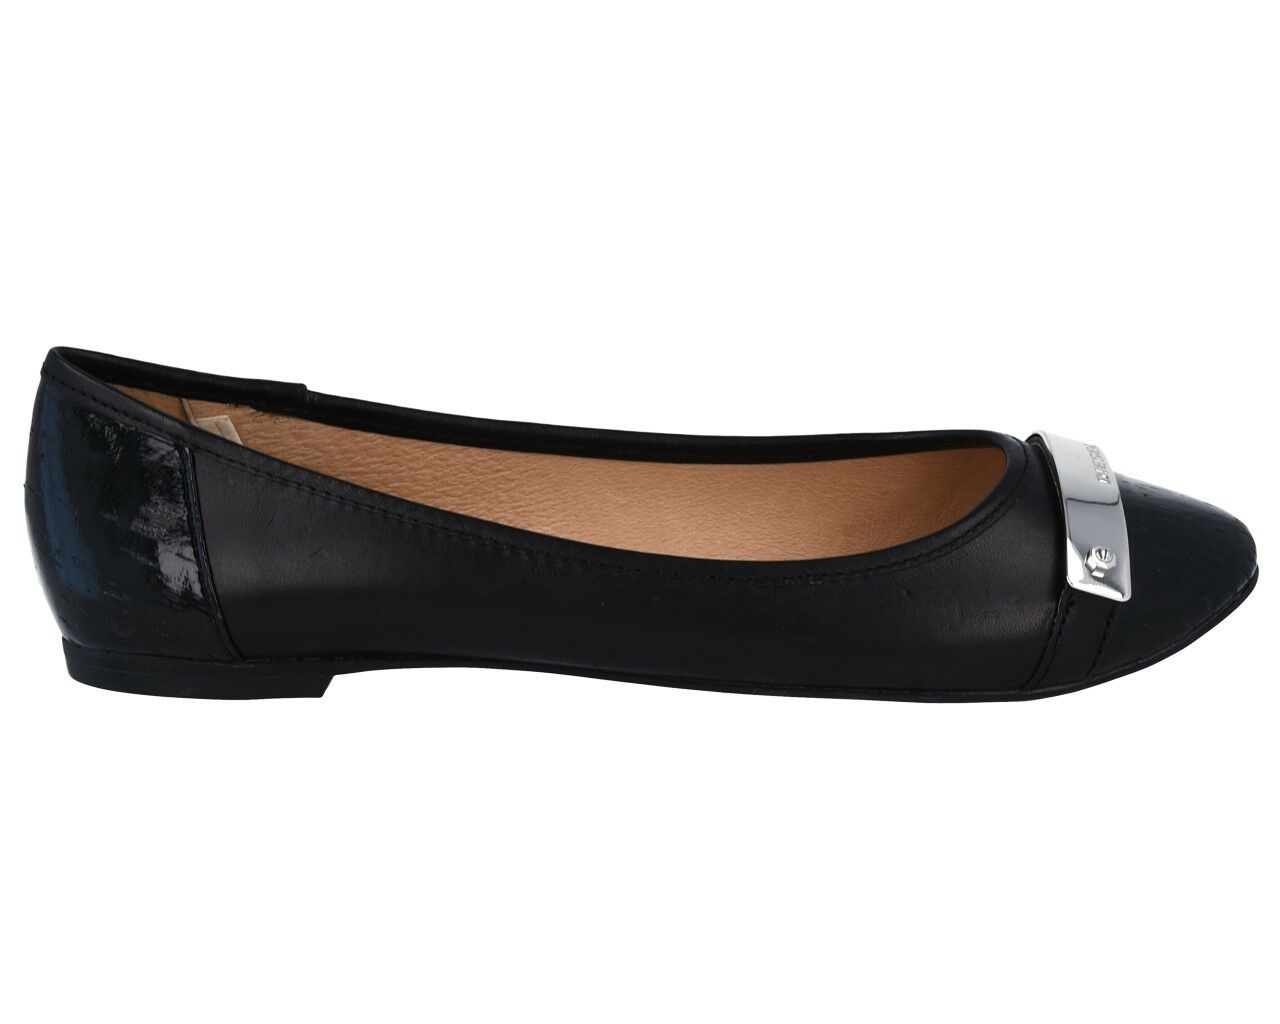 $190 Women's Authentic DIESEL Women's $190 Galyal Flats Hot Red Ballerina Dress Shoes 0bab44